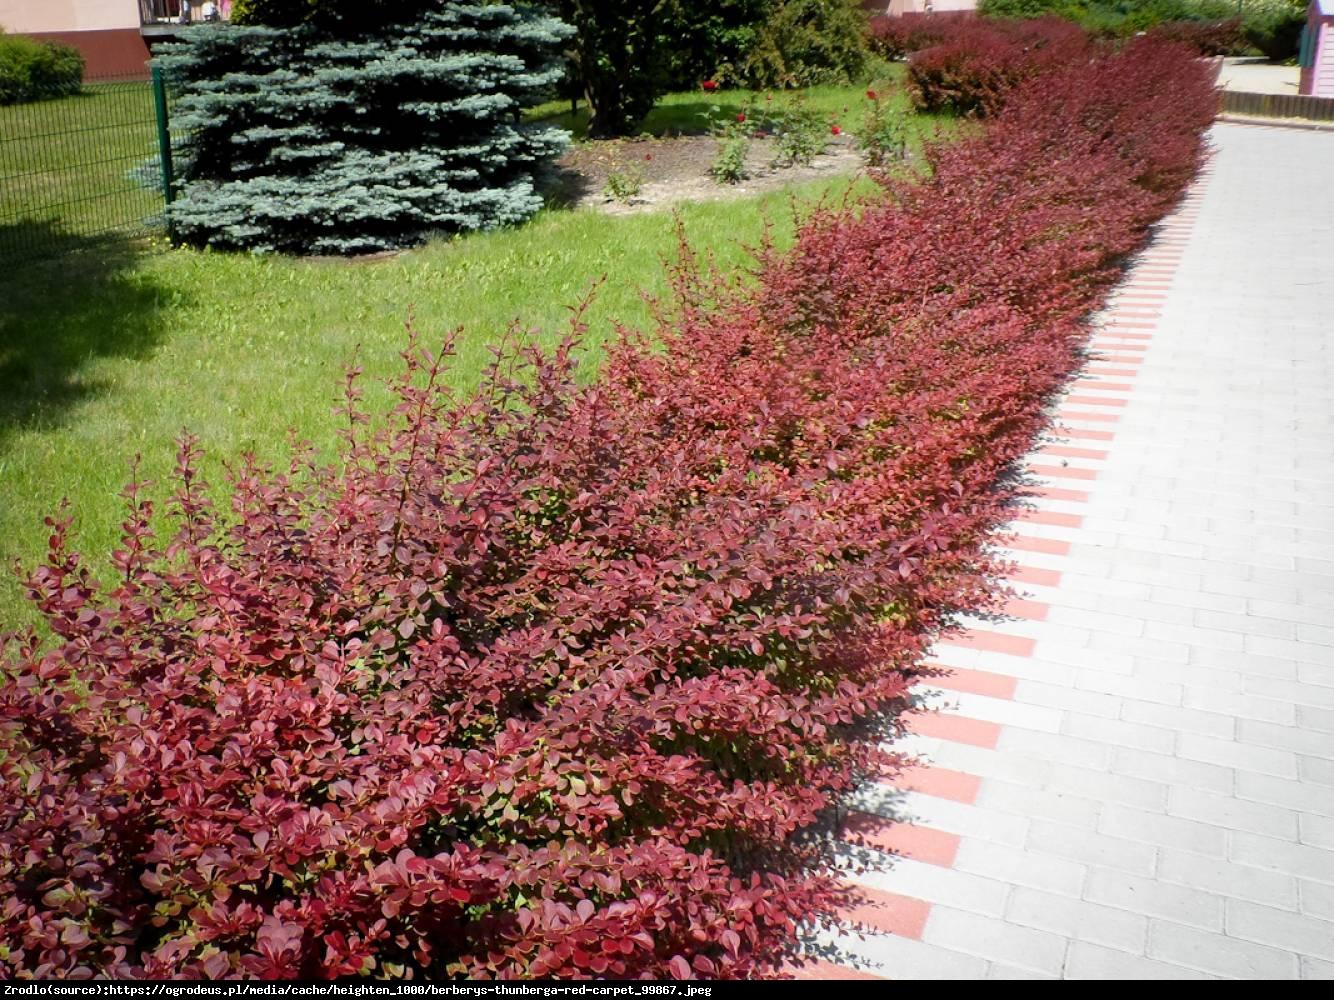 Berberys Red Carpet - Berberis thunbergii Red Carpet